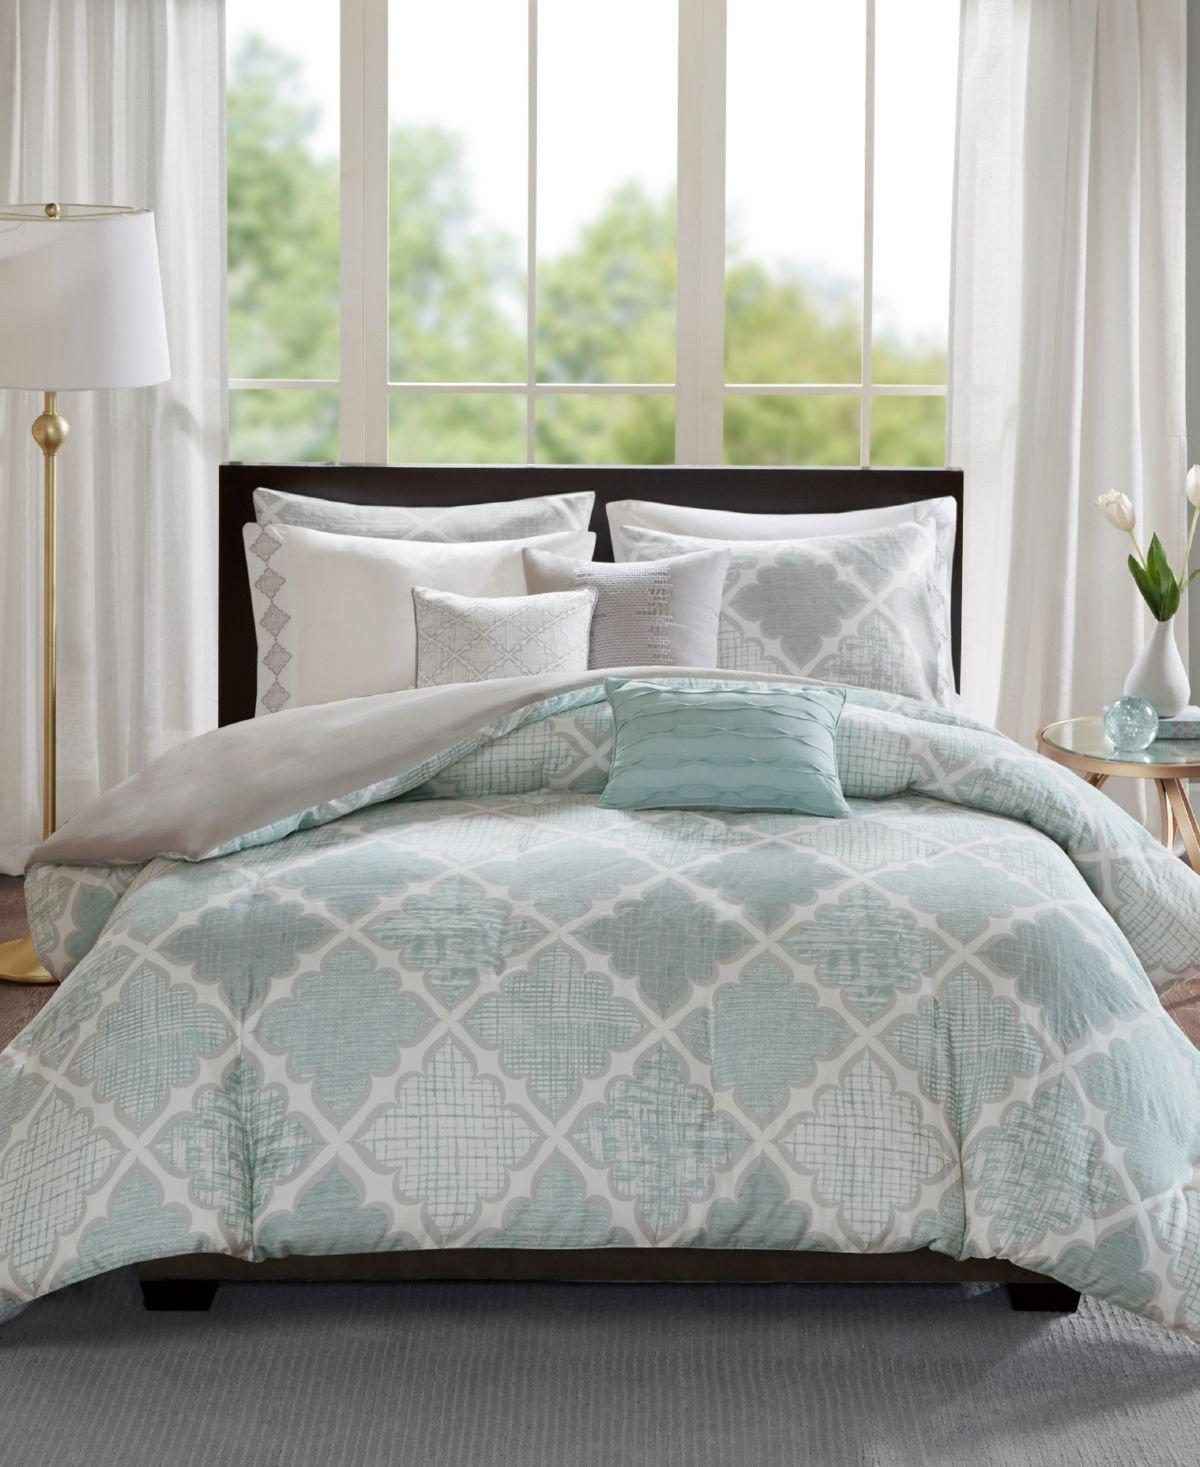 King Size Bedroom Comforter Set Lovely Madison Park Cadence Cotton 8 Pc King California King Duvet